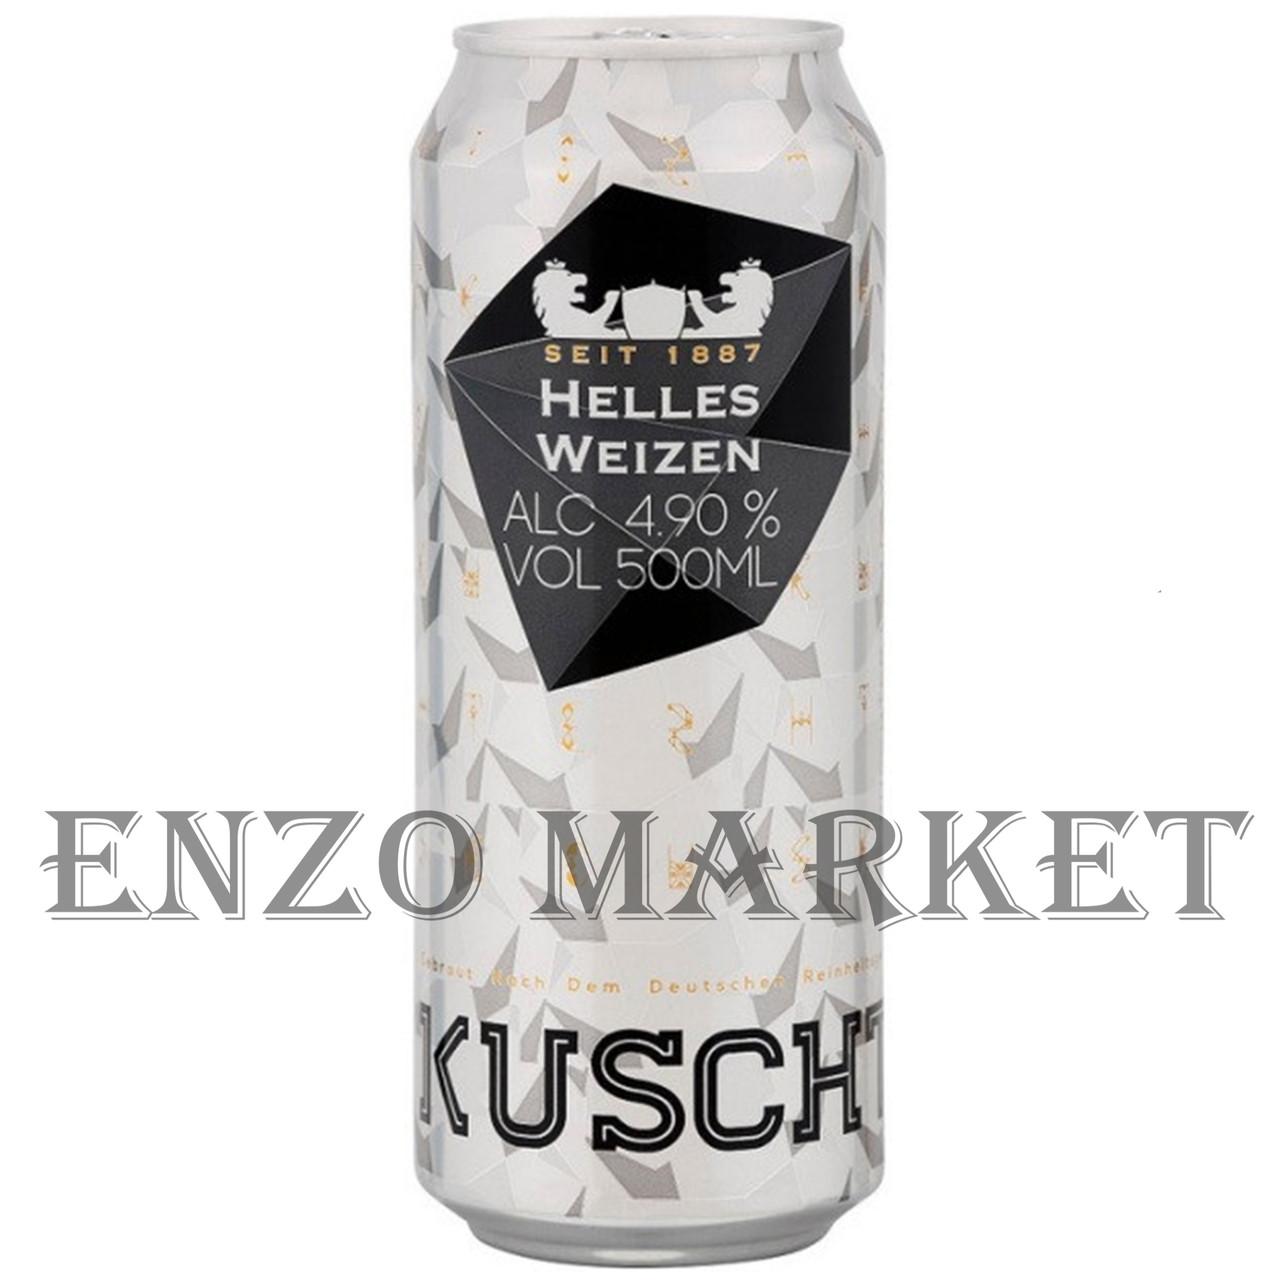 Пиво Kuschter Helles Weizen светлое, 0,5 литра